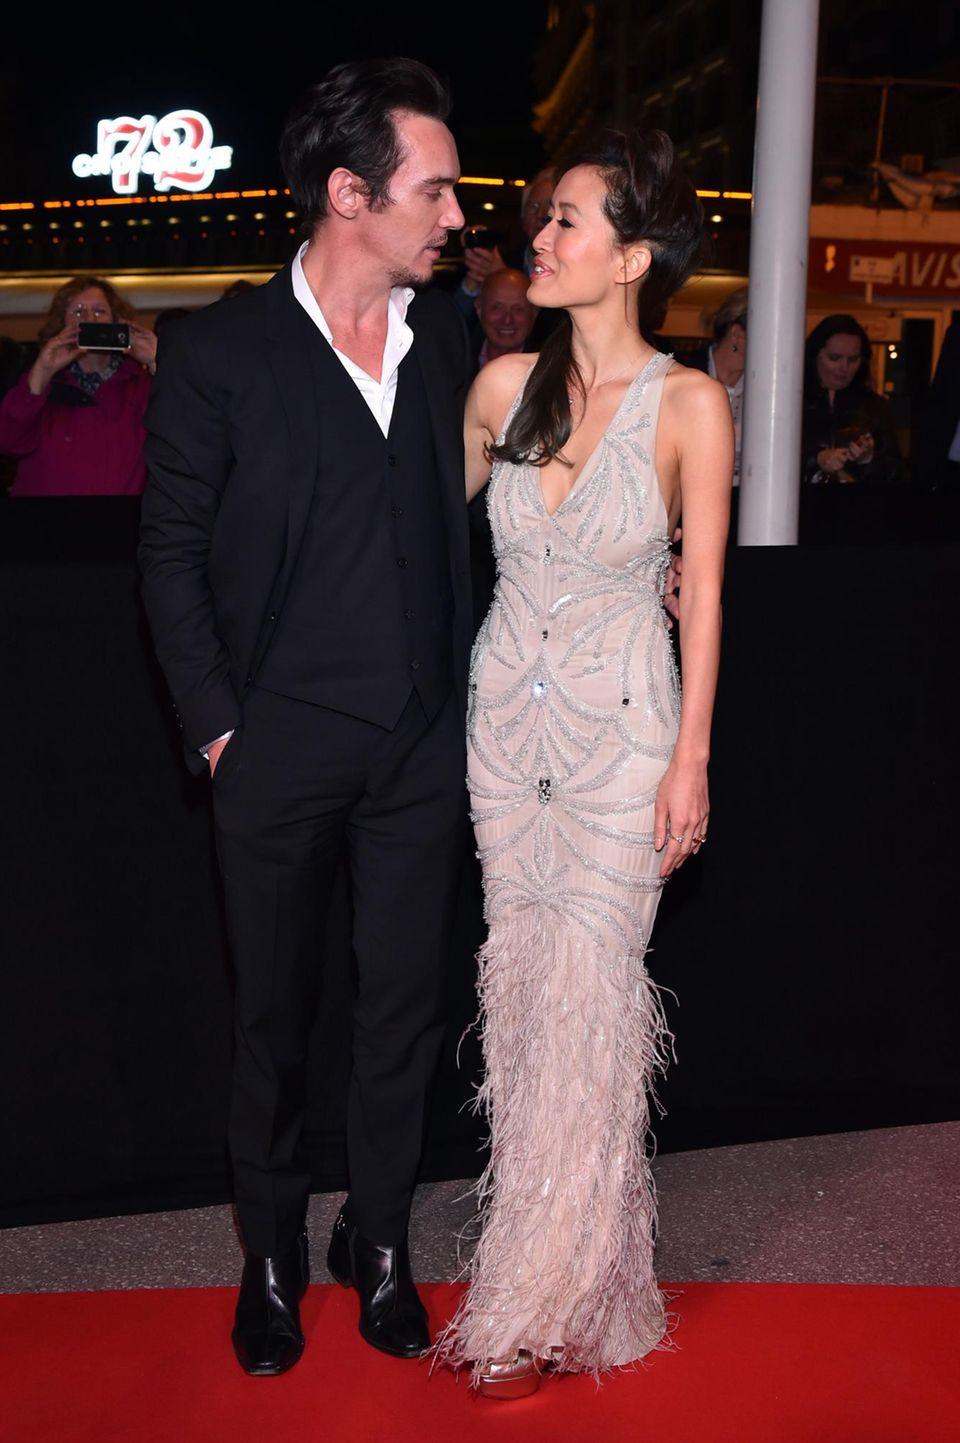 Jonathan Rhys Meyers + Mara Lane